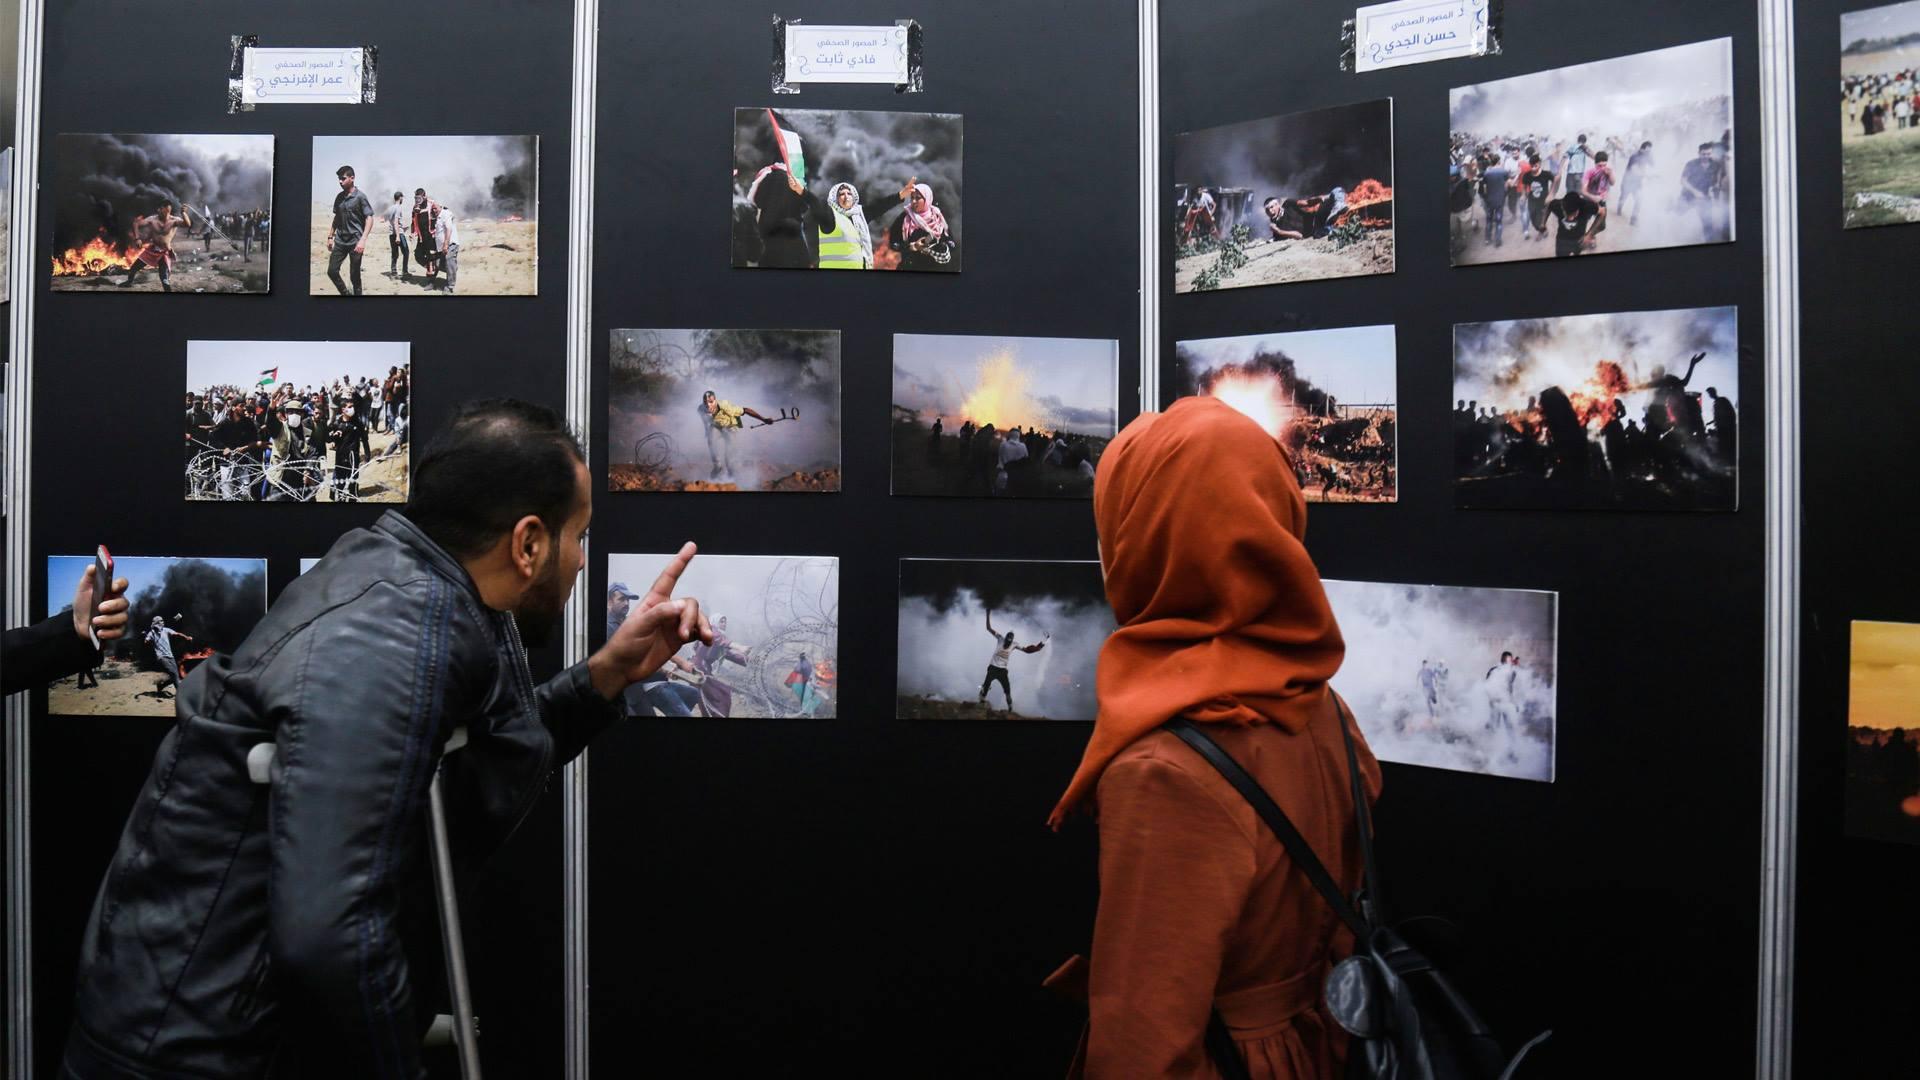 Photo of فنانون وموهوبونَ يجسّدونَ أروعَ صوَرِ الحياةِ في مخيماتِ العودةِ